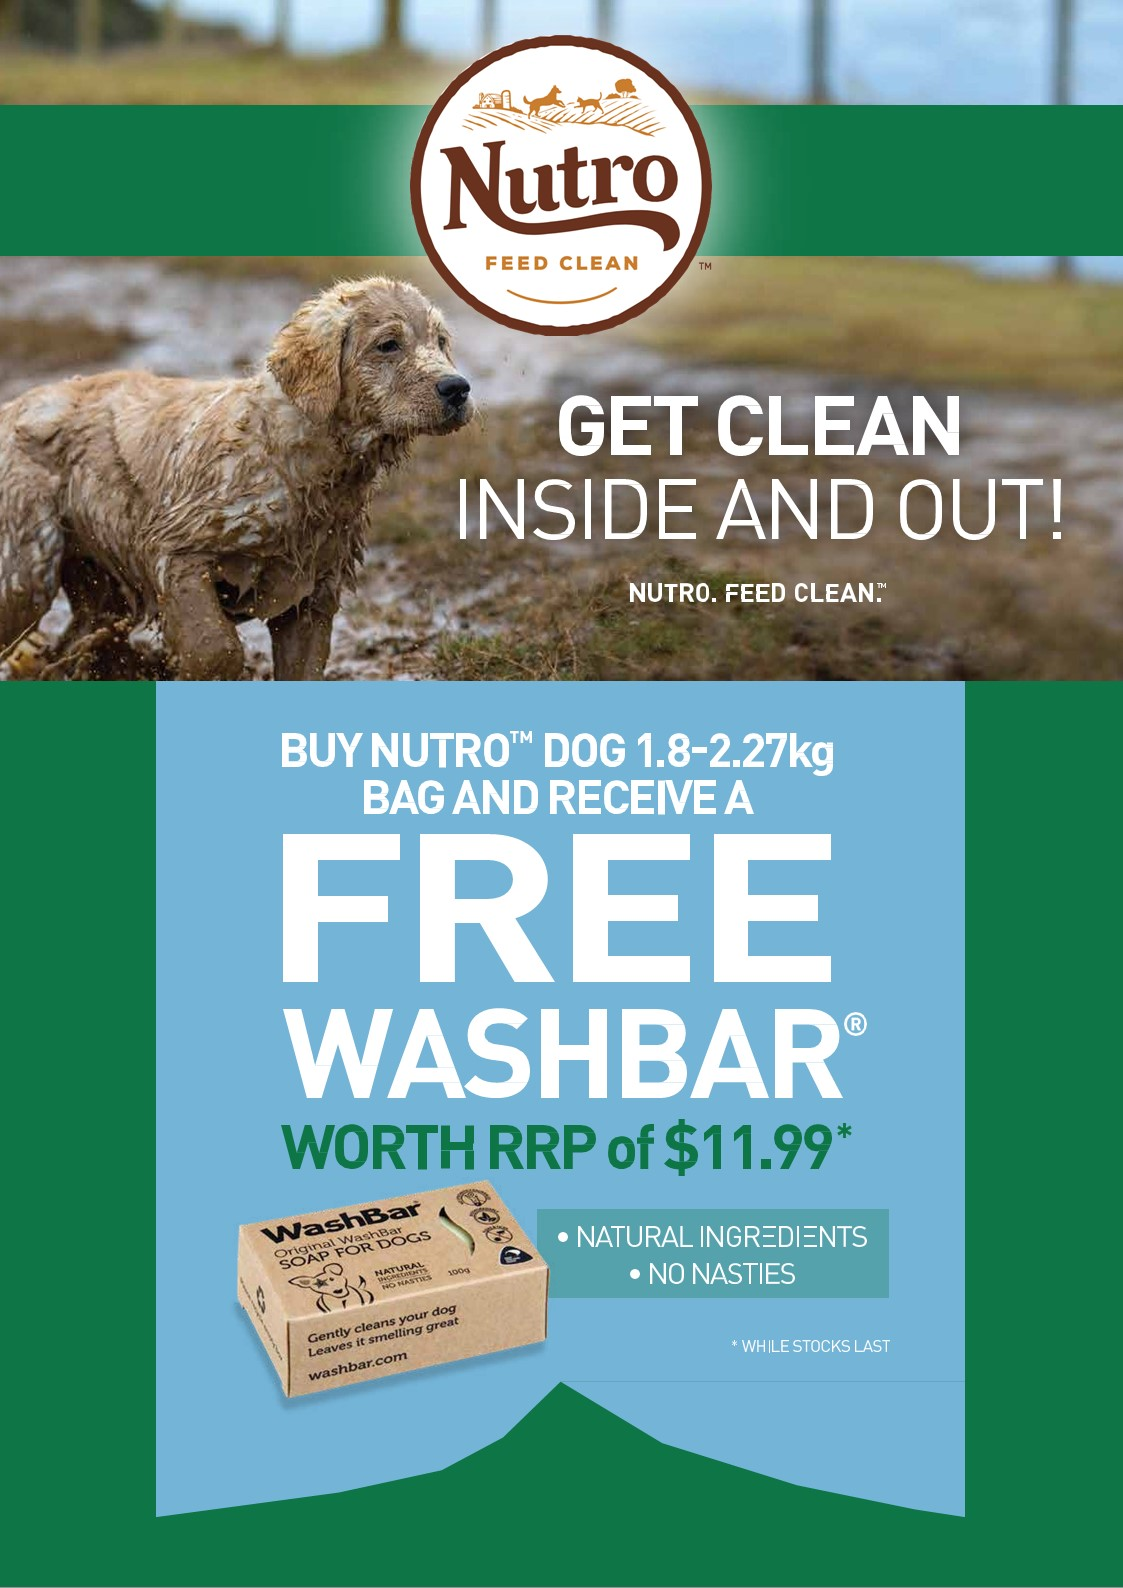 Free Washbar With Nutro 1.8kg – 2.72kg